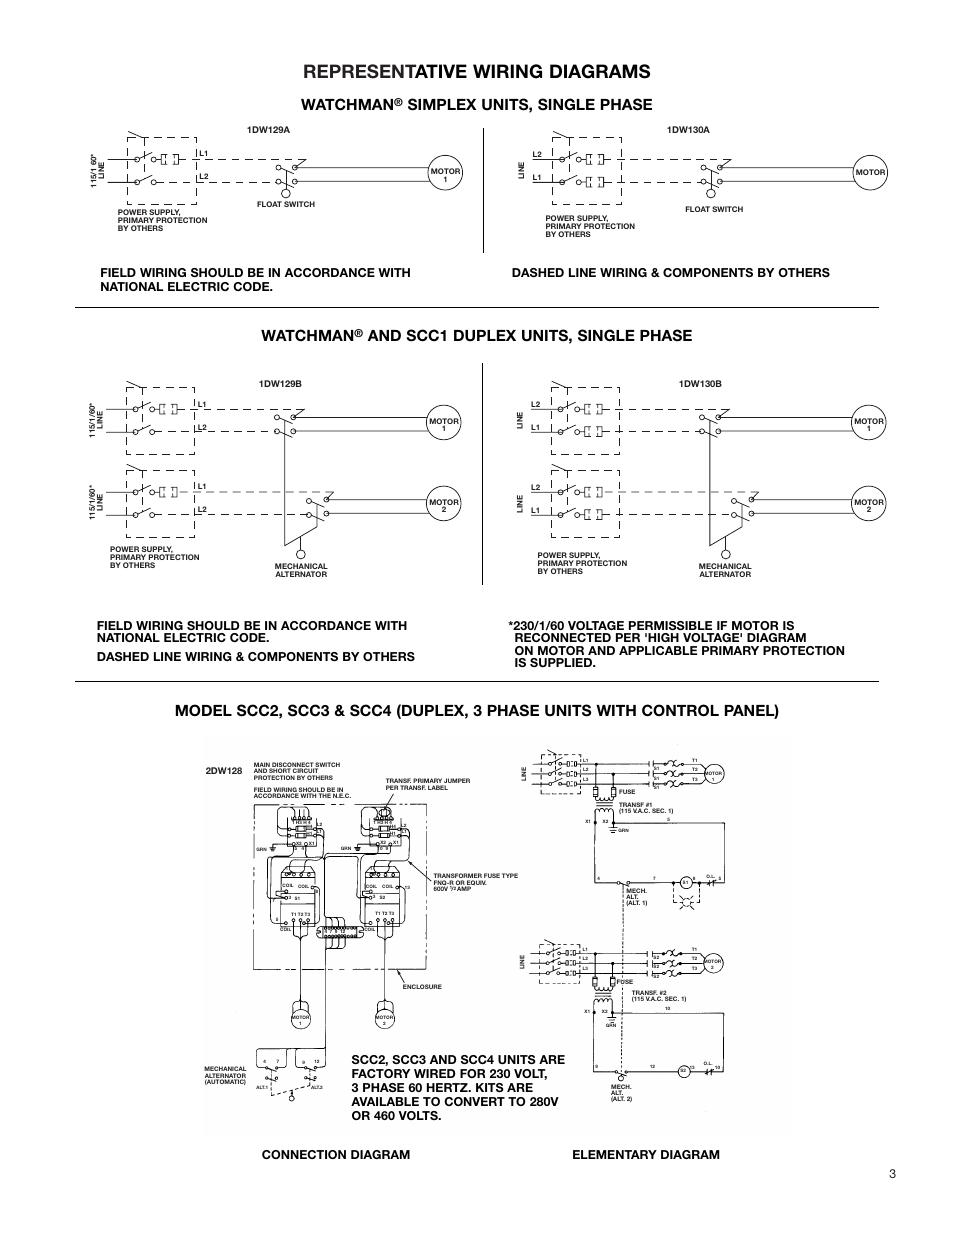 Represent Ative Wiring Diagrams  Watchman  Simplex Units